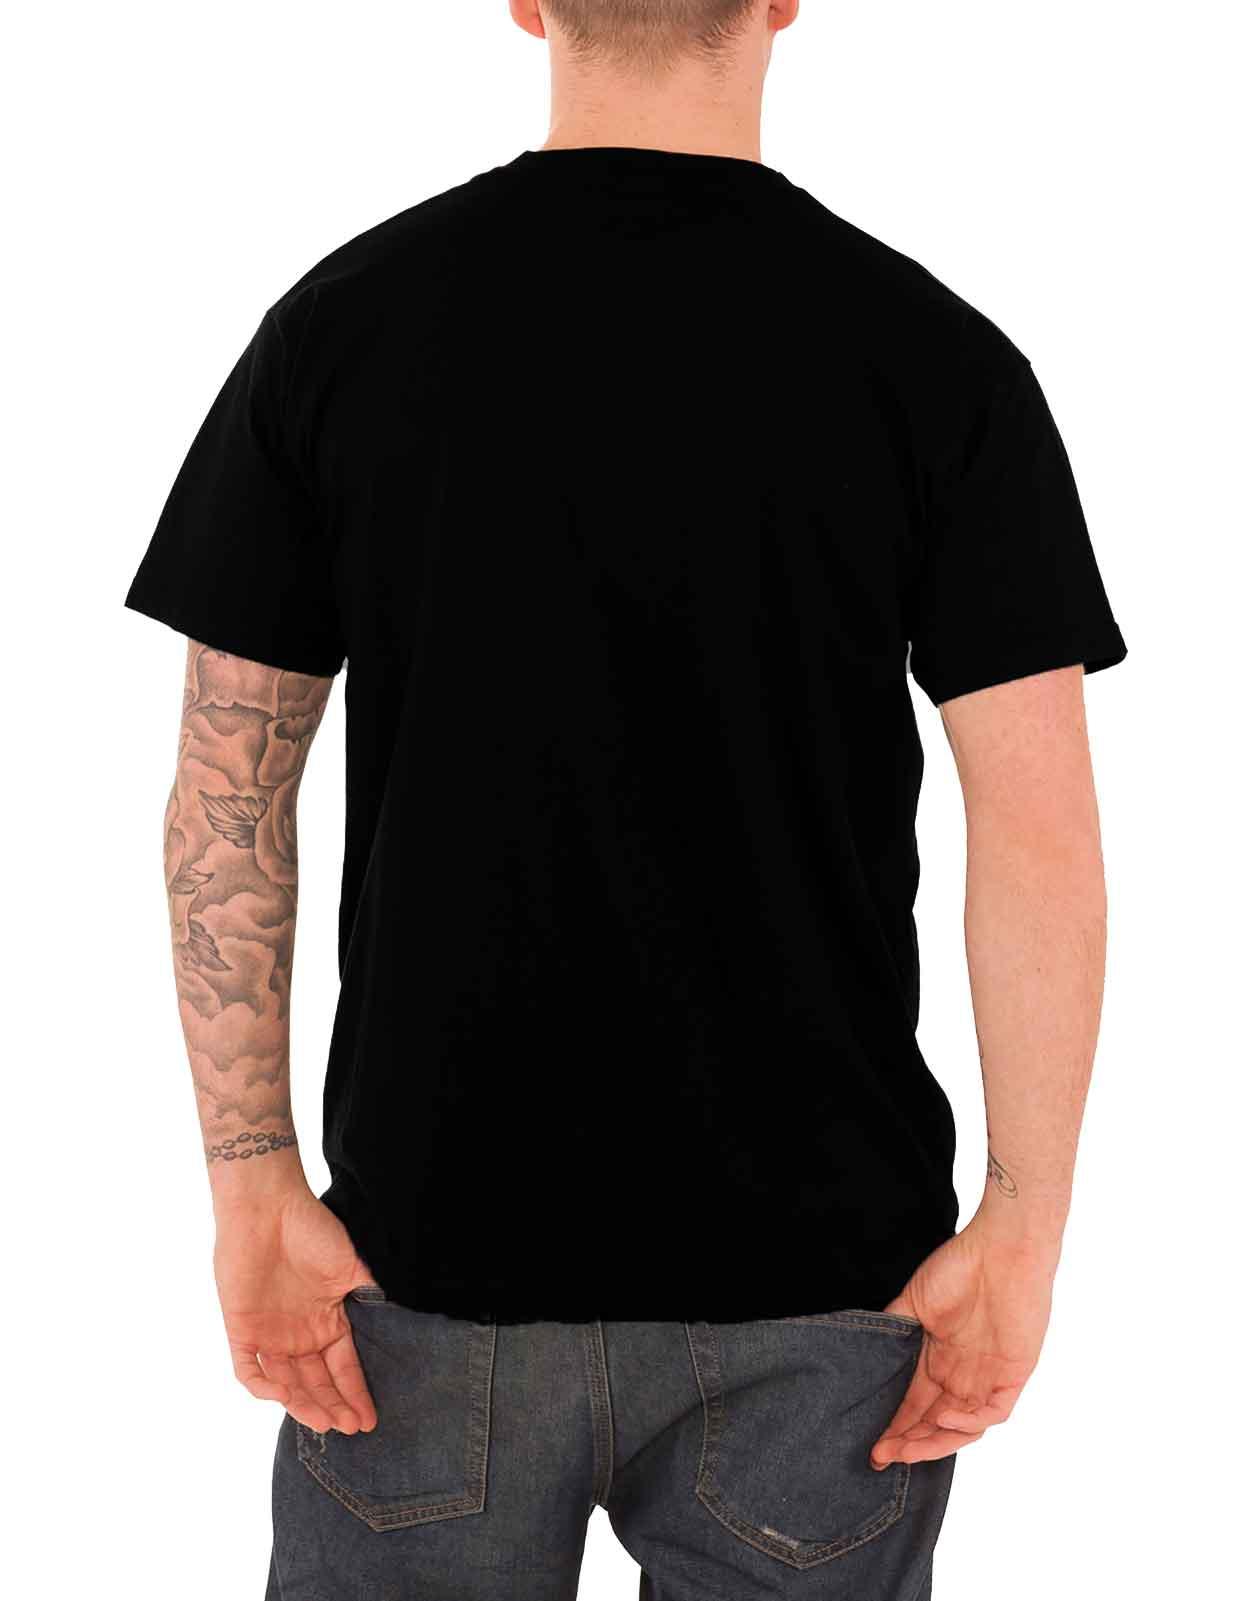 Officiel-Jimi-Hendrix-T-Shirt-Purple-Haze-Are-you-experienced-Logo-Homme-NEUF miniature 11